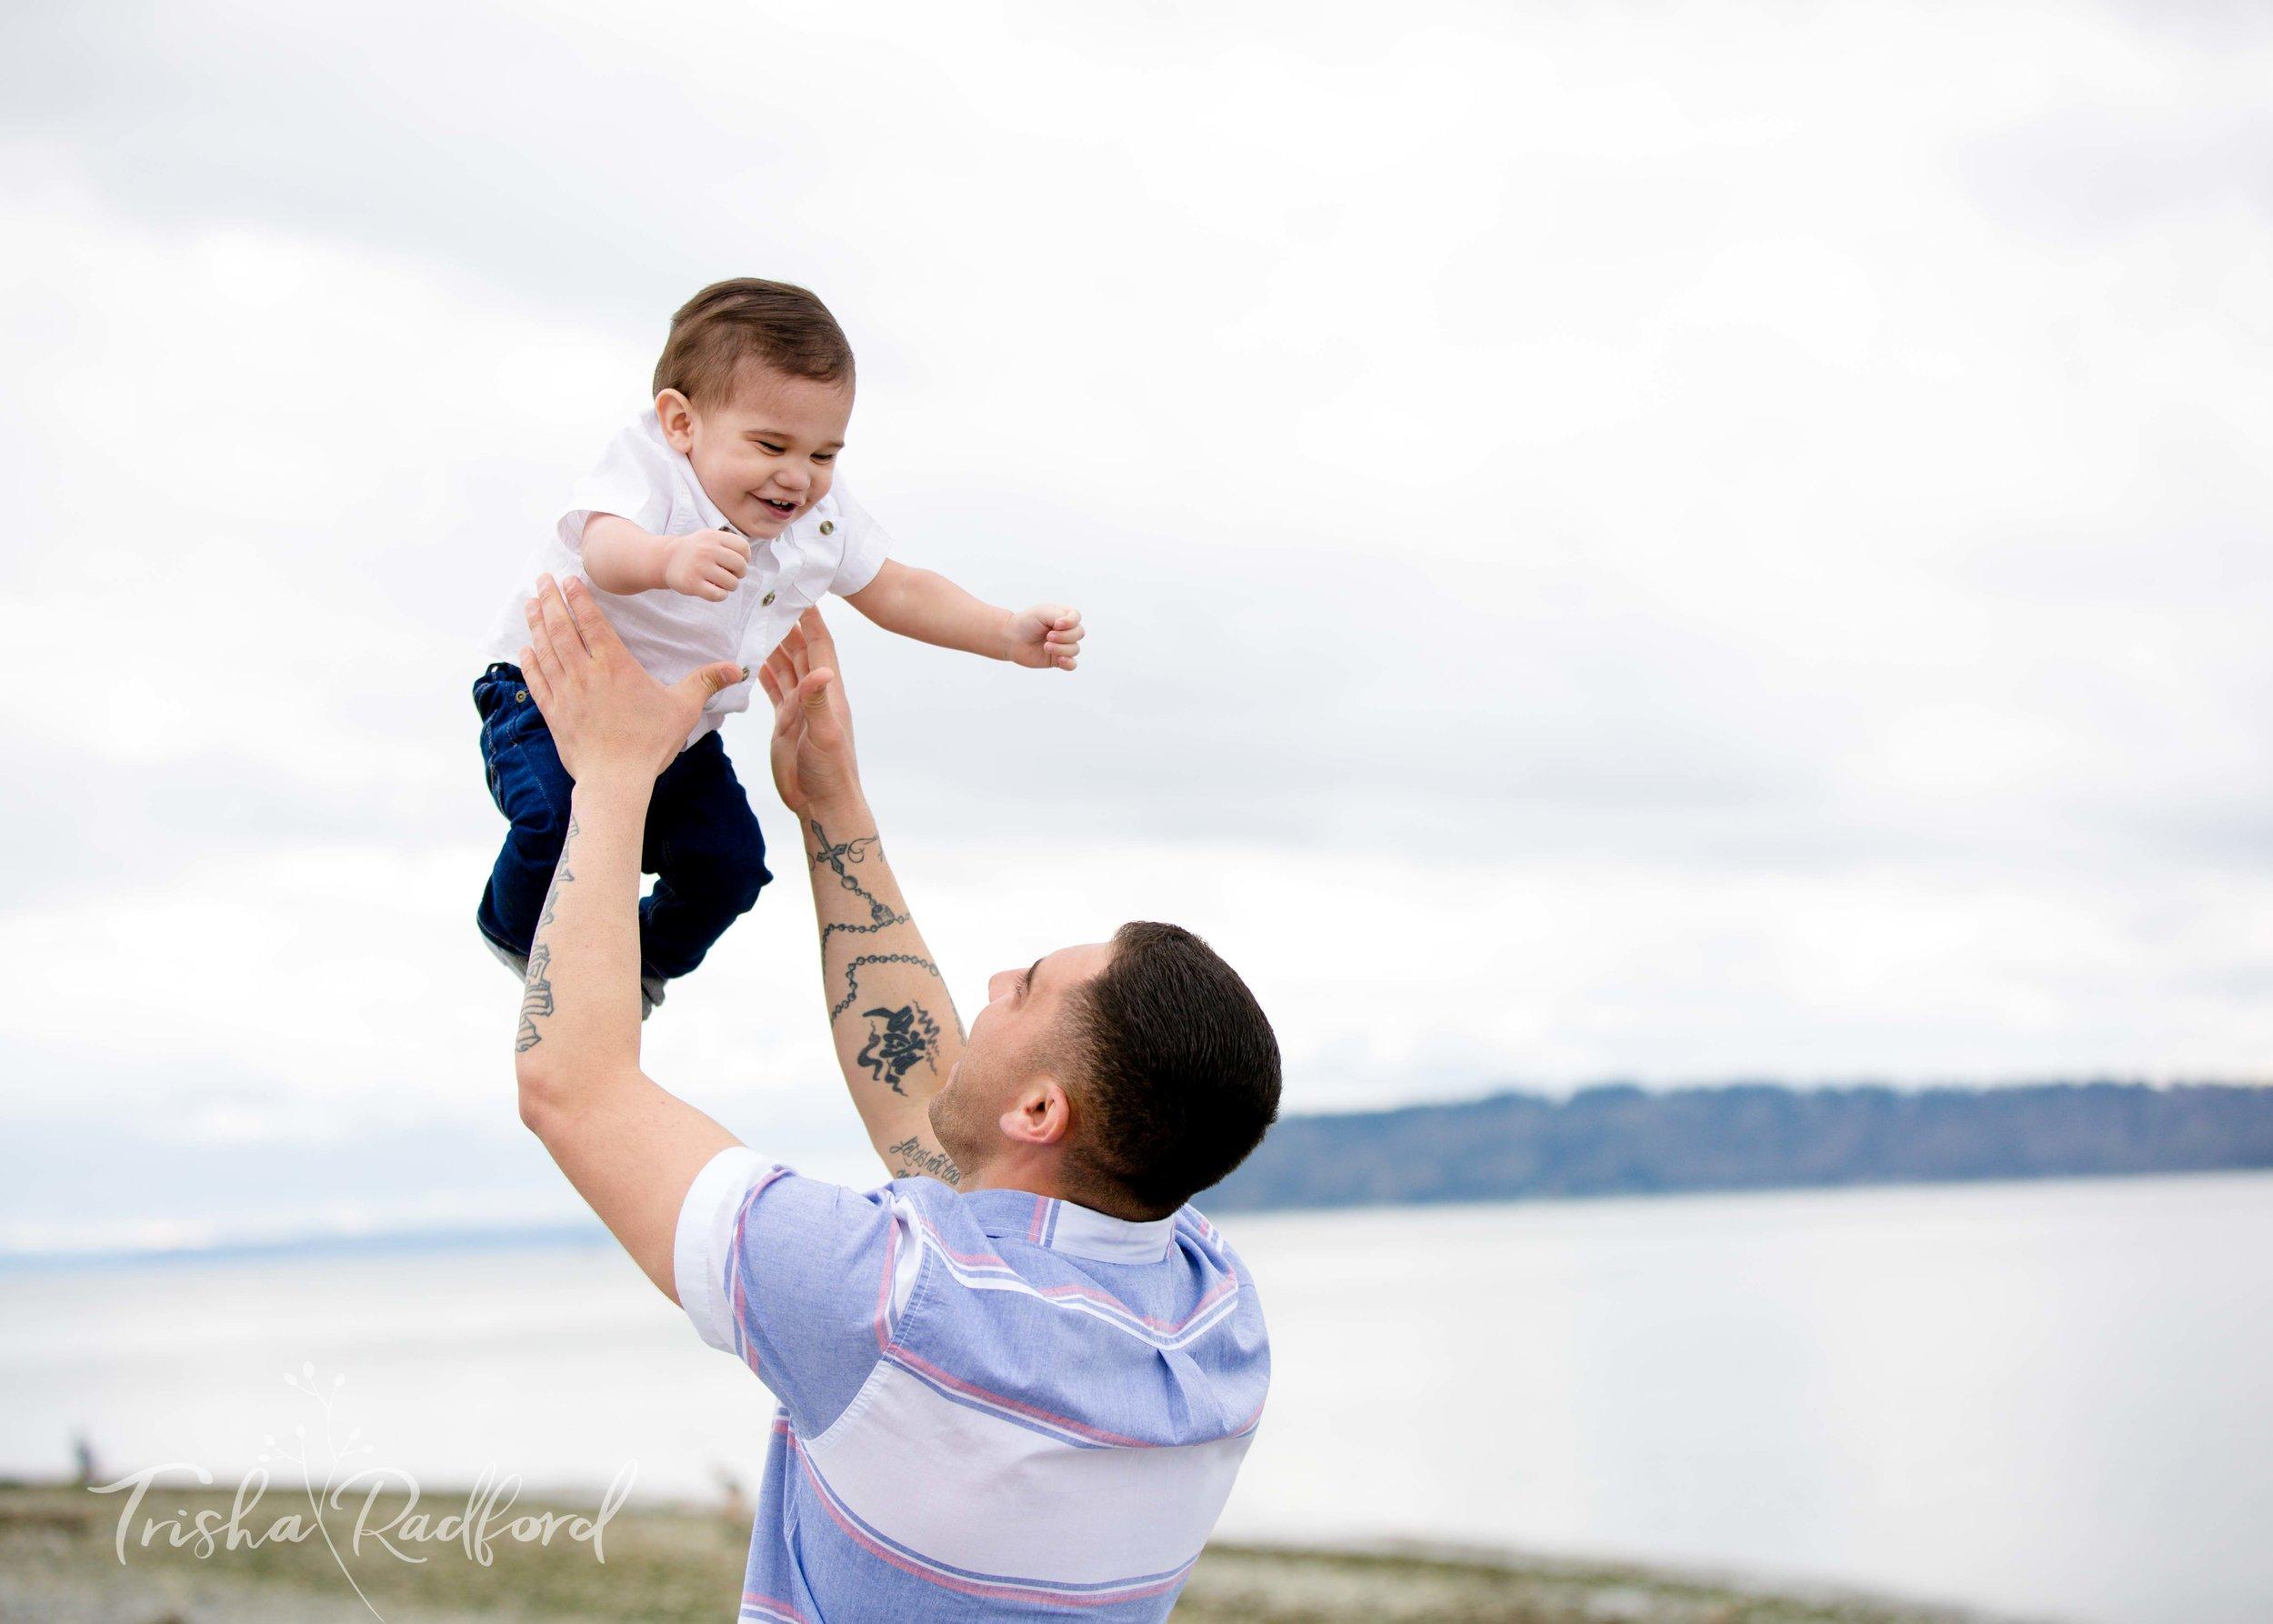 Snohomish County Family Photographer, Mukilteo Beach, Family Portraits, Toddler Photographer